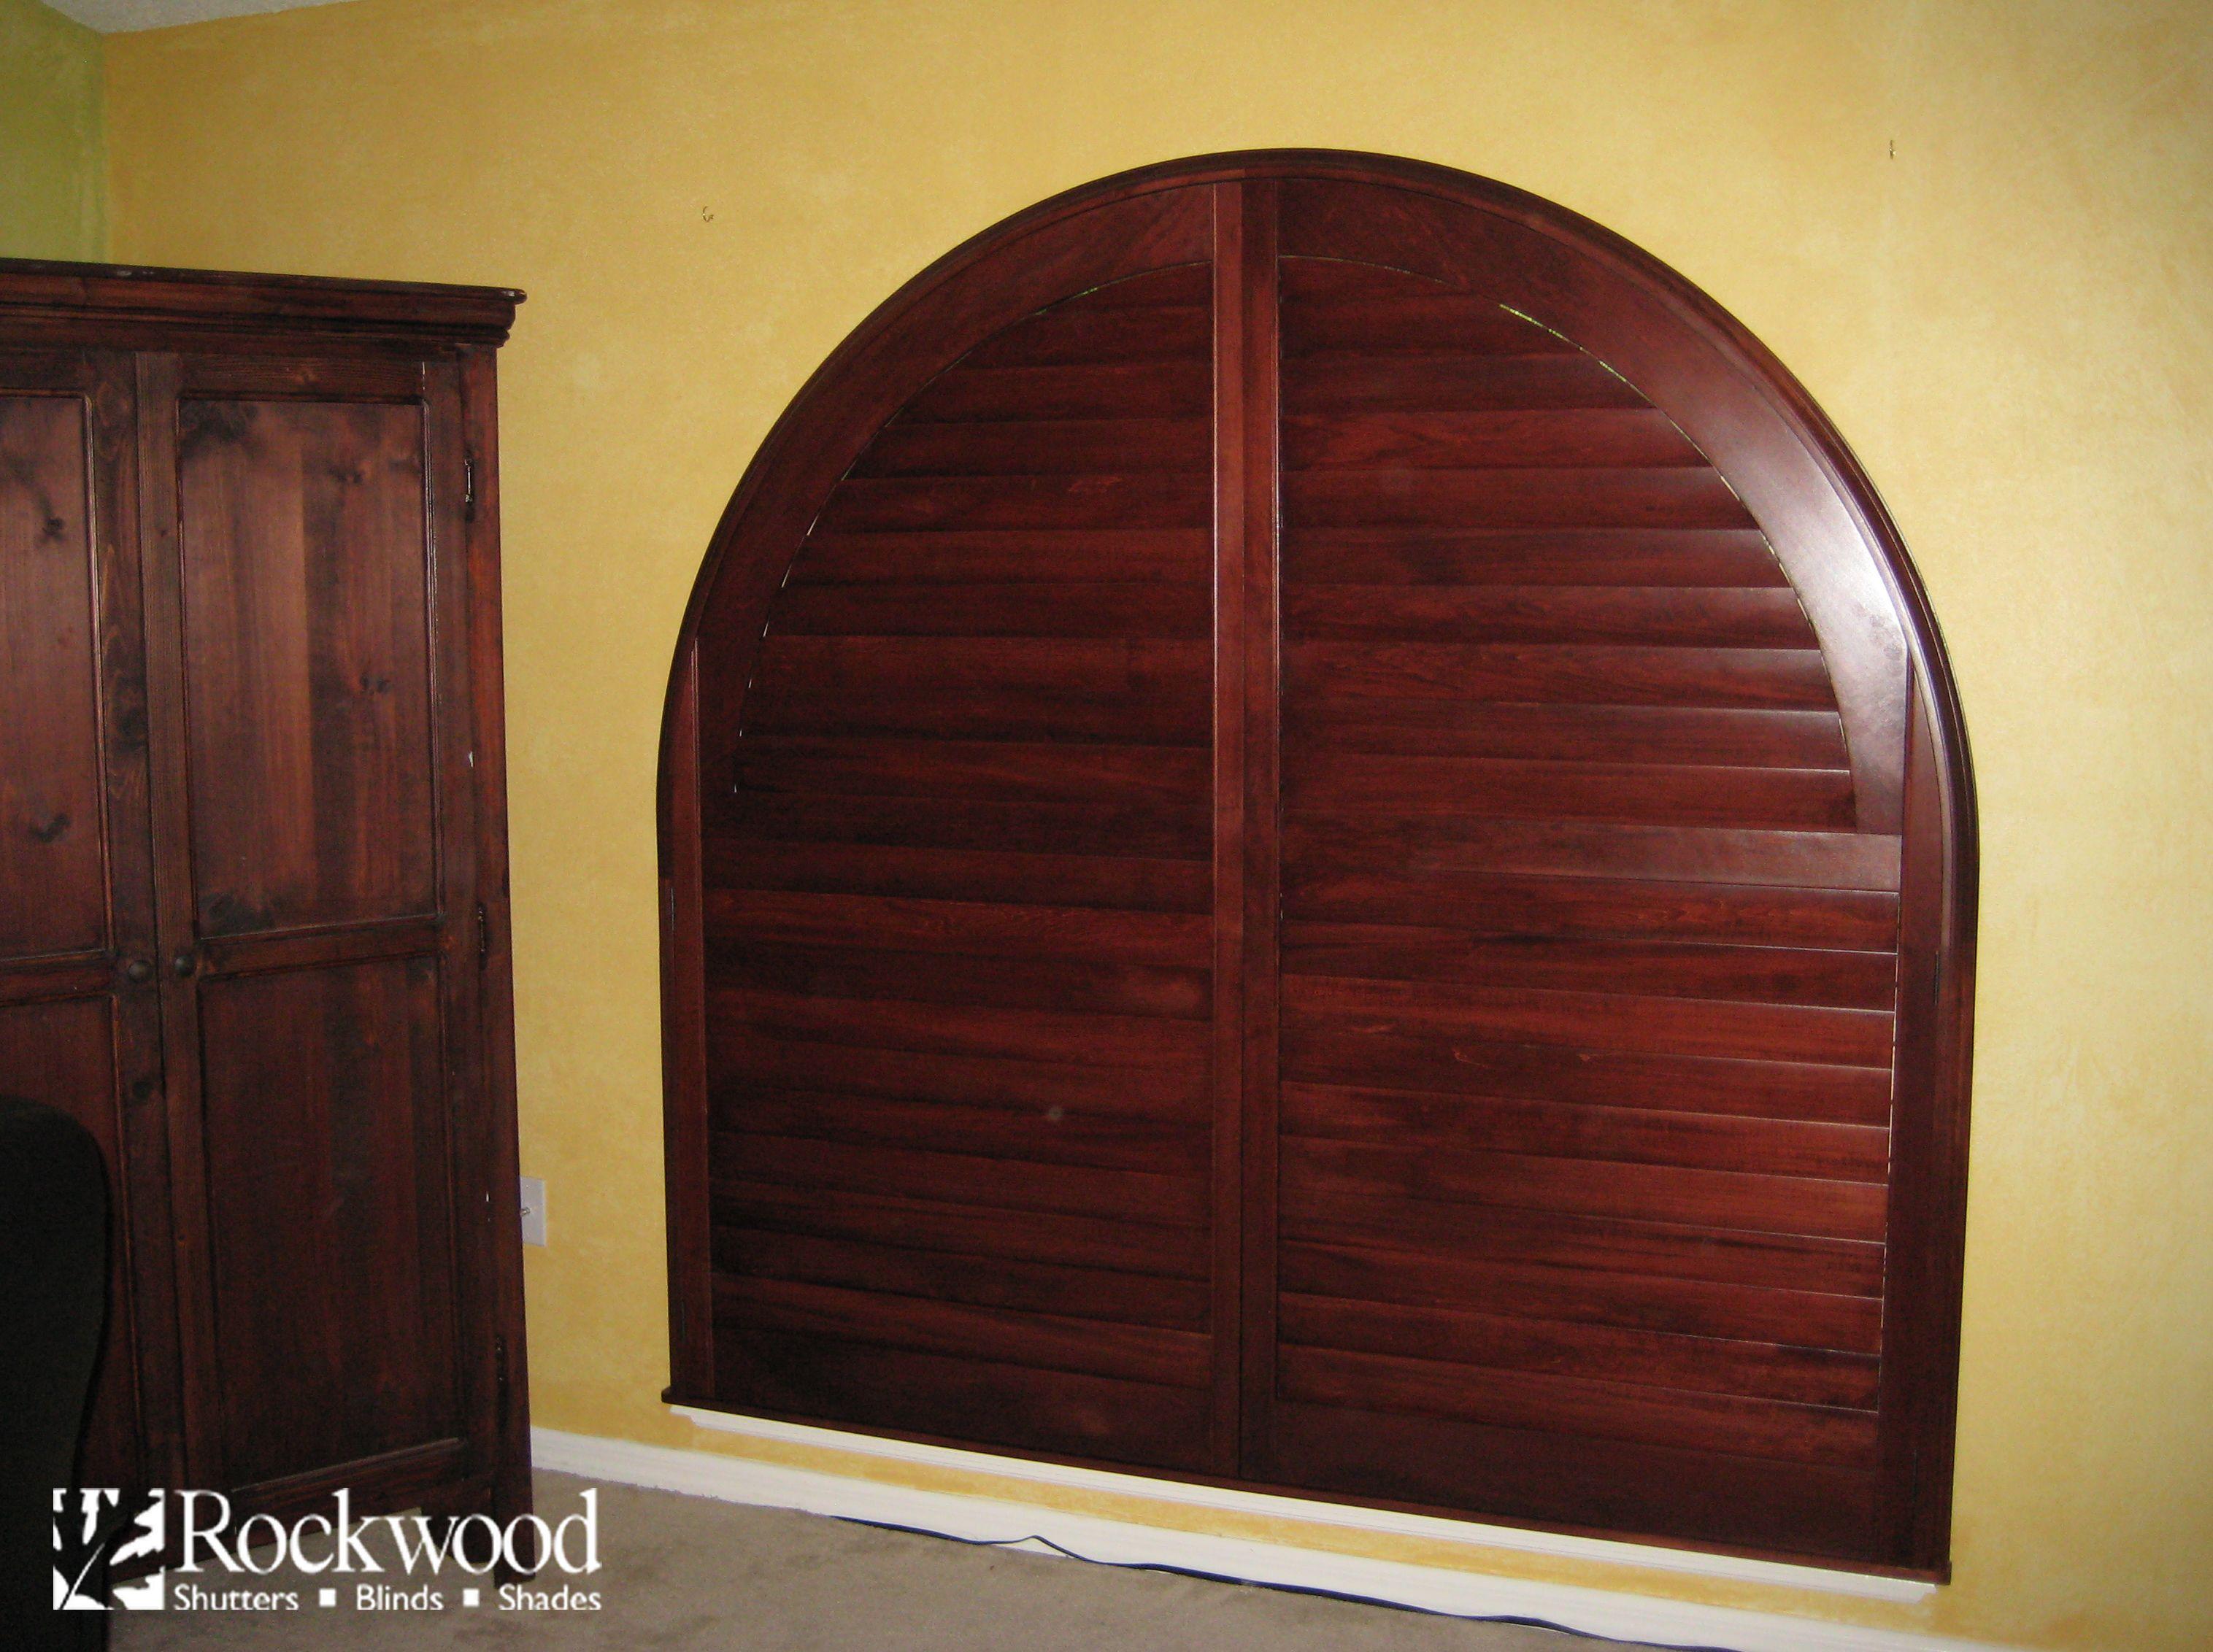 Dark Stained Hardwood Custom Made Arch Shutters Shutters